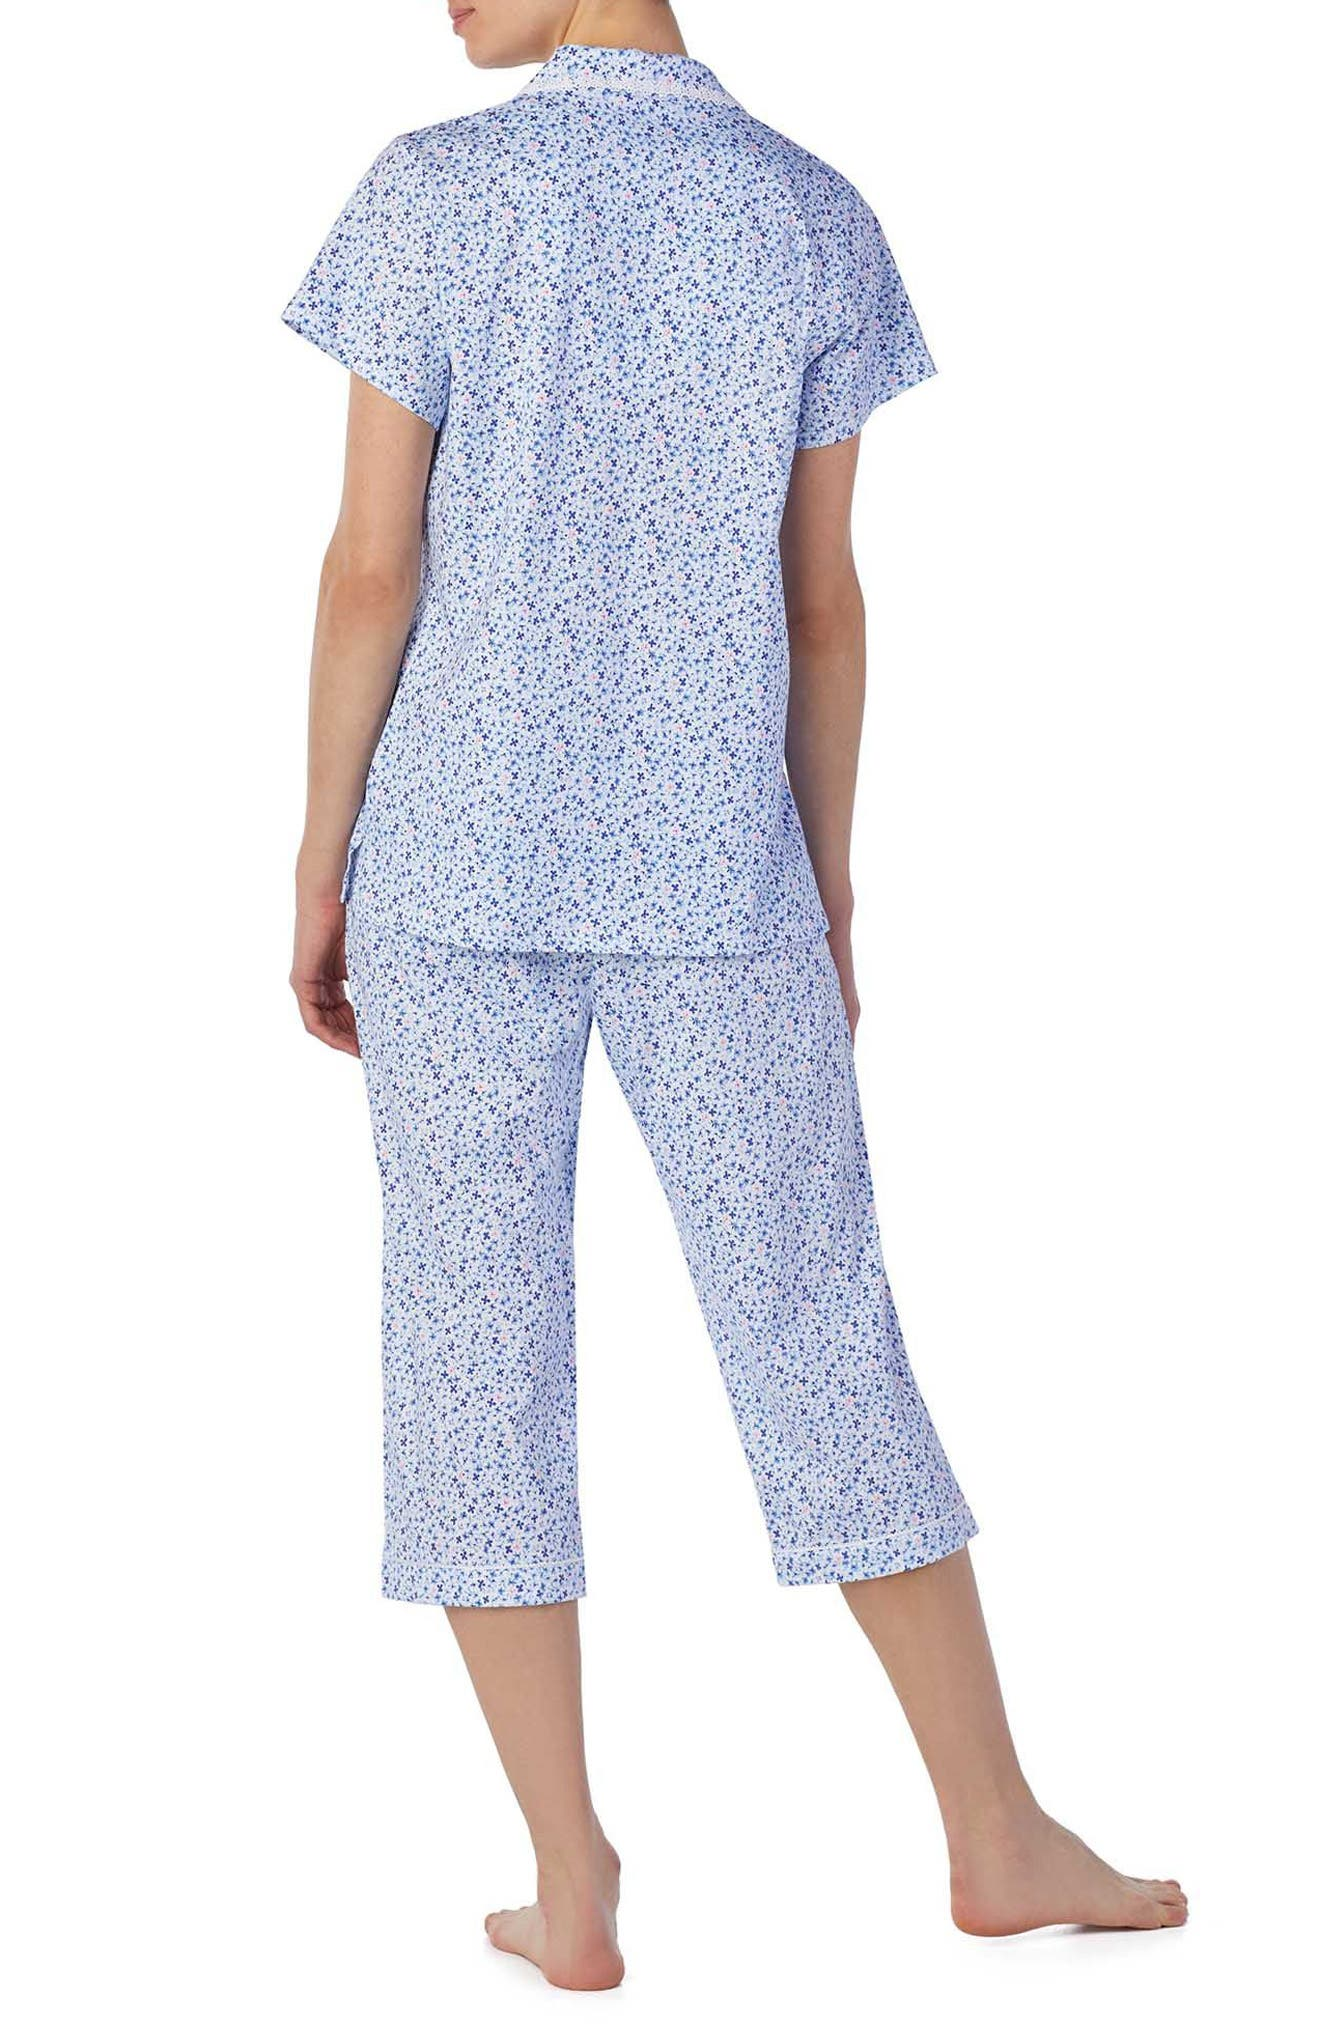 Jersey Capri Pajamas,                             Alternate thumbnail 2, color,                             Pink/ Blue